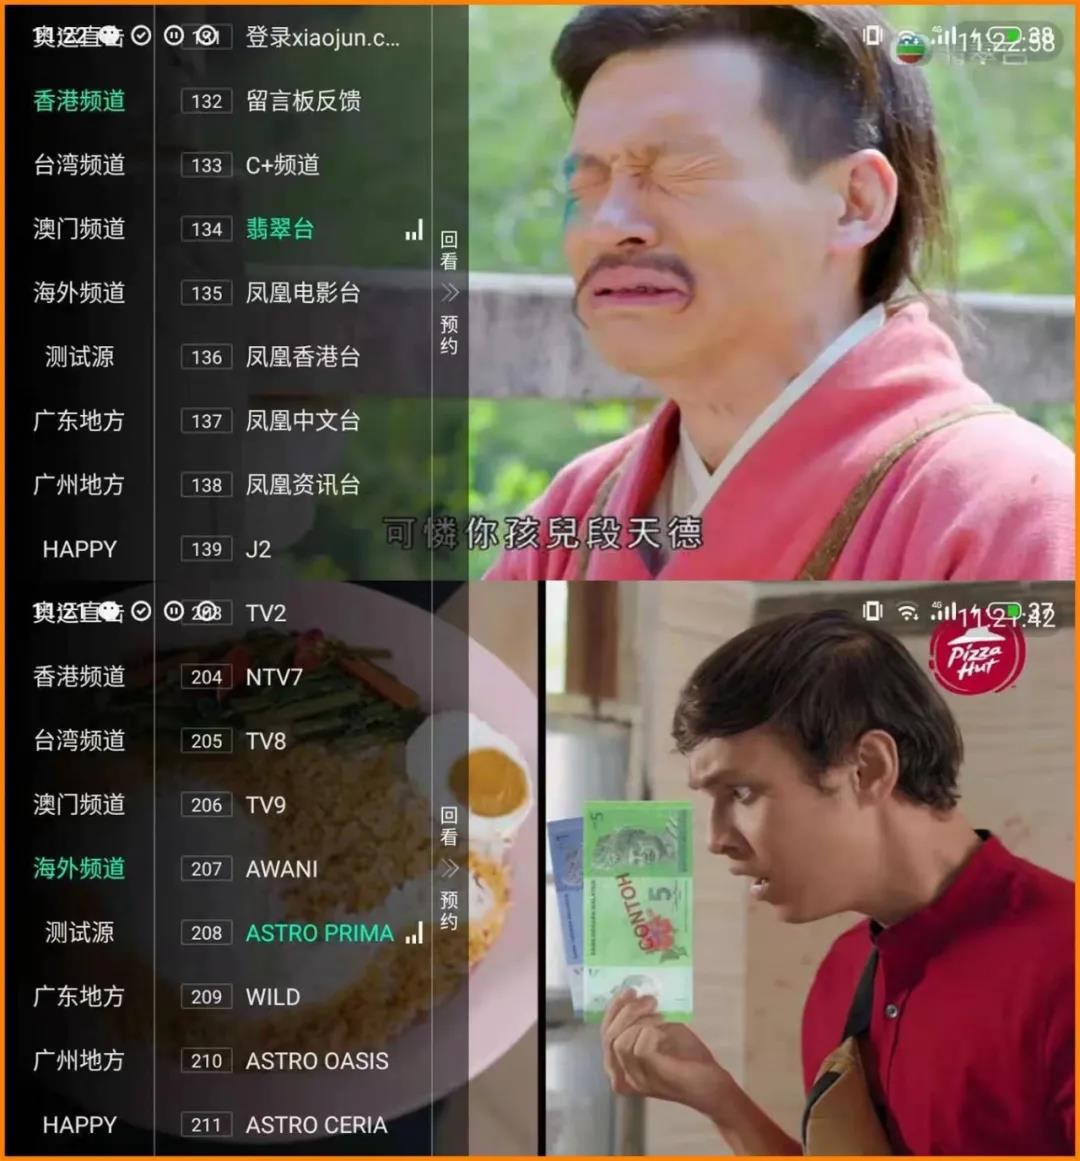 小君TV v3.1 免授权版